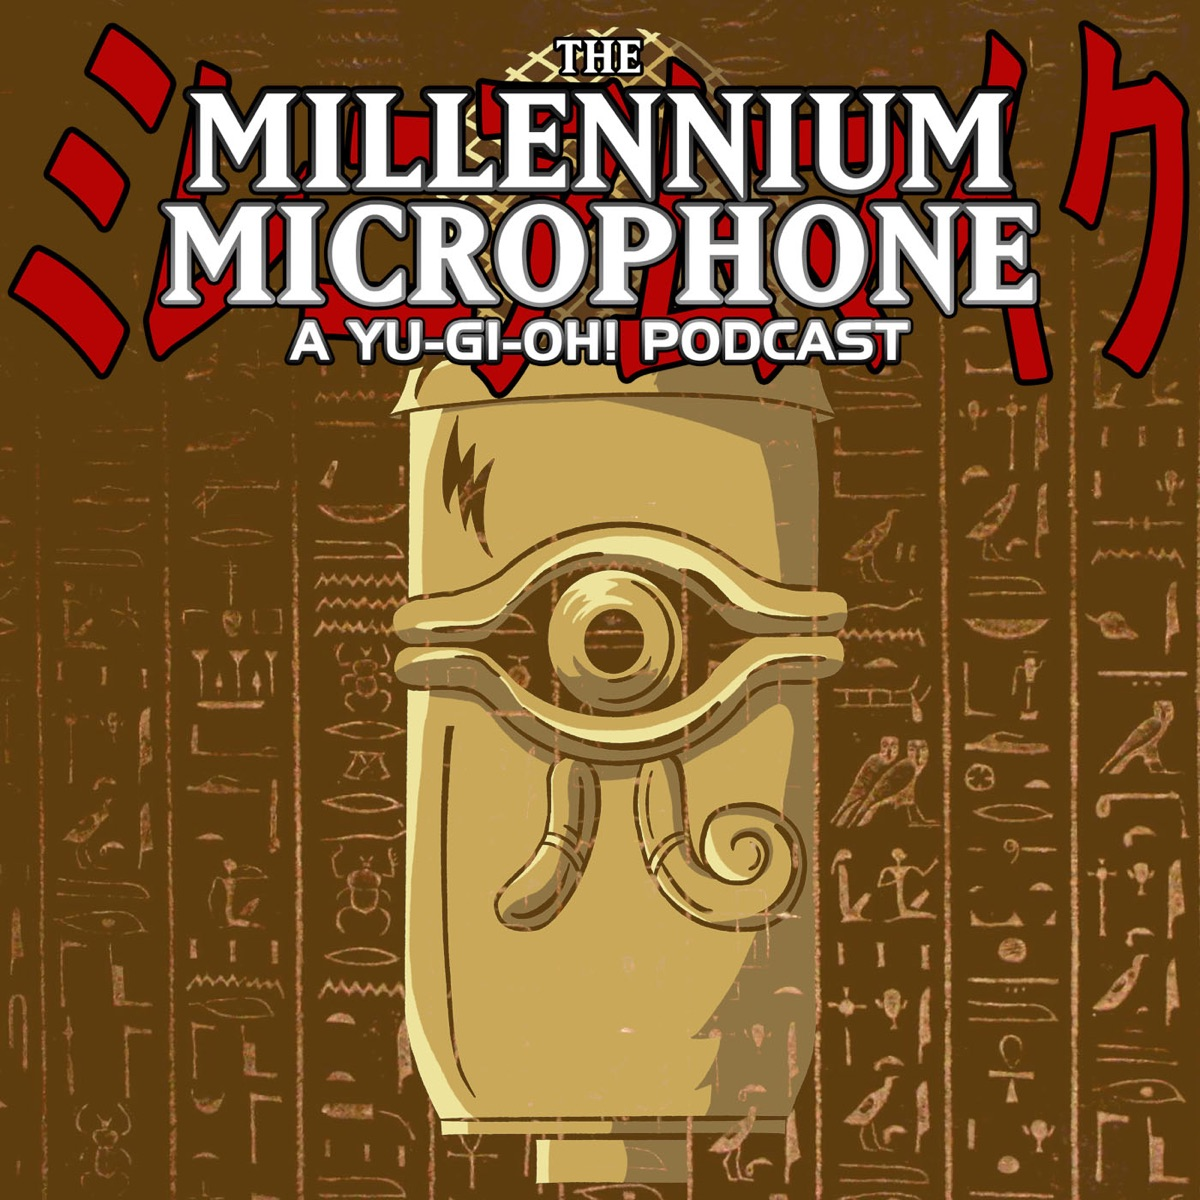 The Millennium Microphone - A Yu-Gi-Oh! Podcast